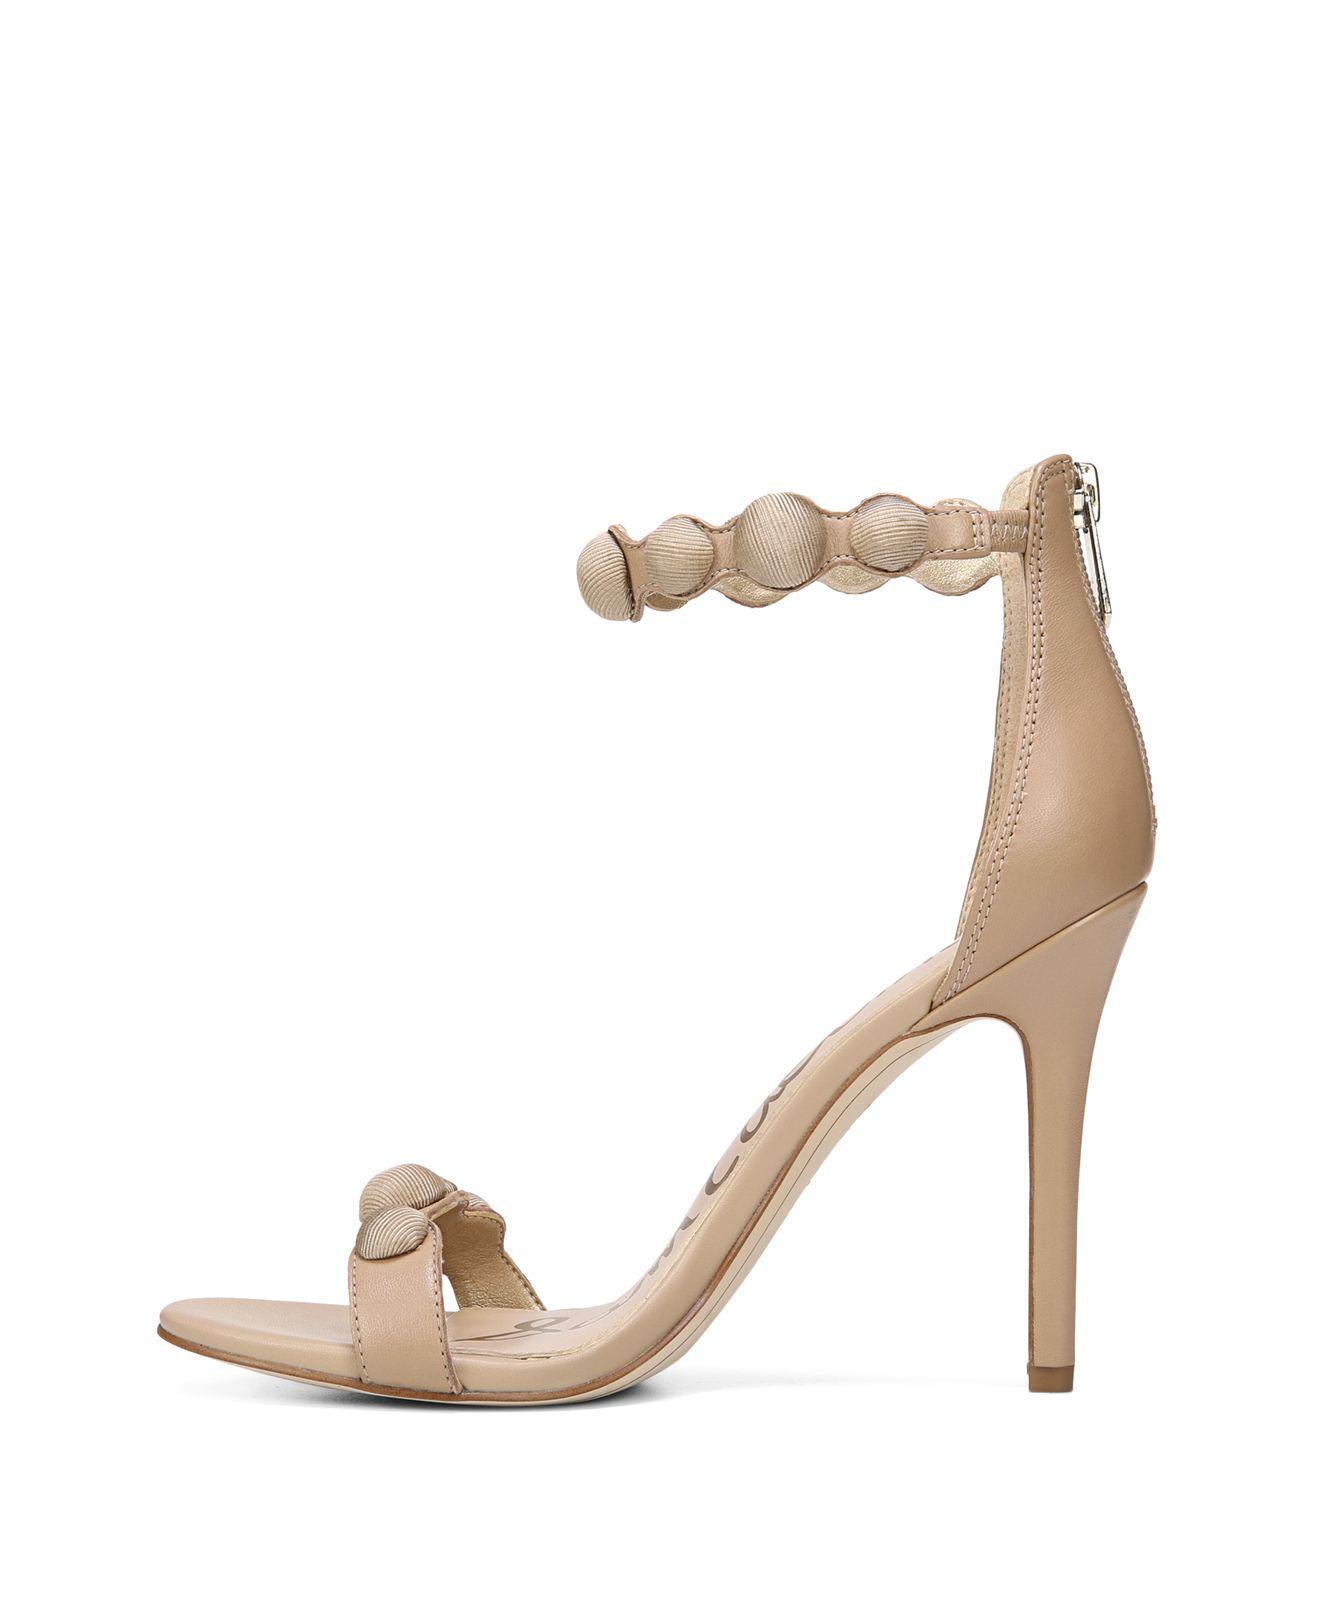 96e4c14ad54 Lyst - Sam Edelman Women s Addison Suede High-heel Ankle Strap ...